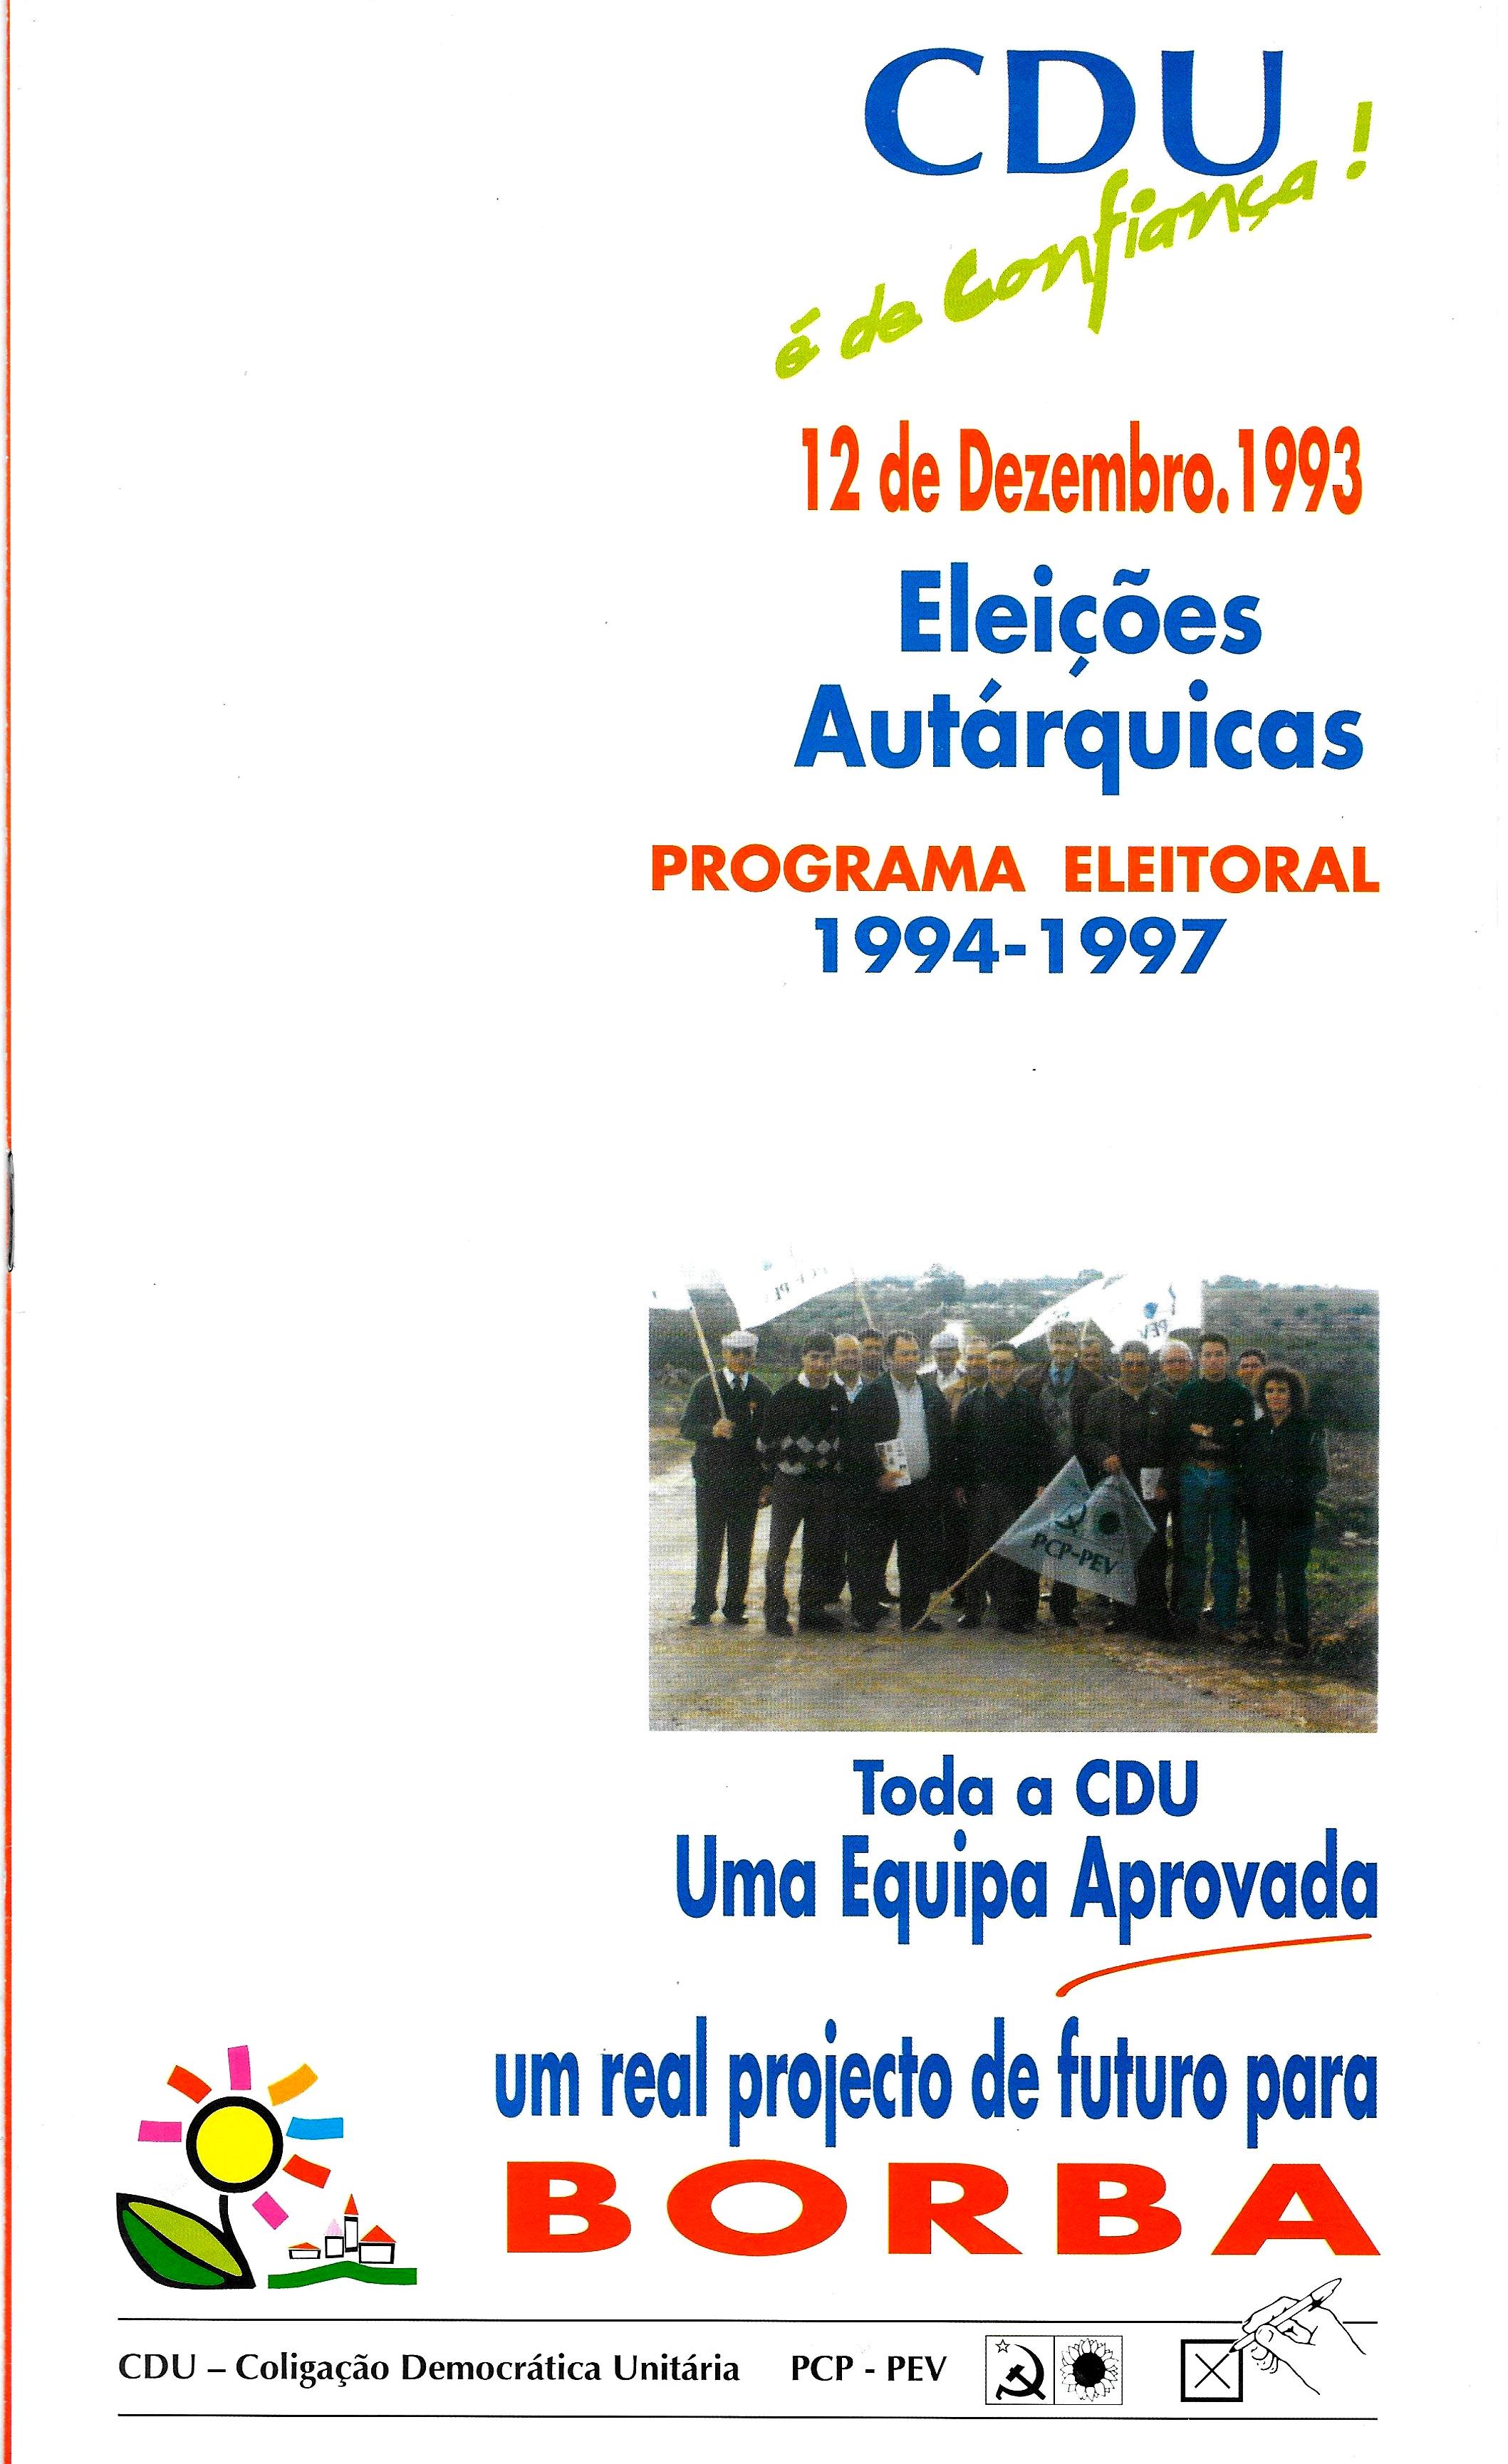 BORBA CDU 1993 1